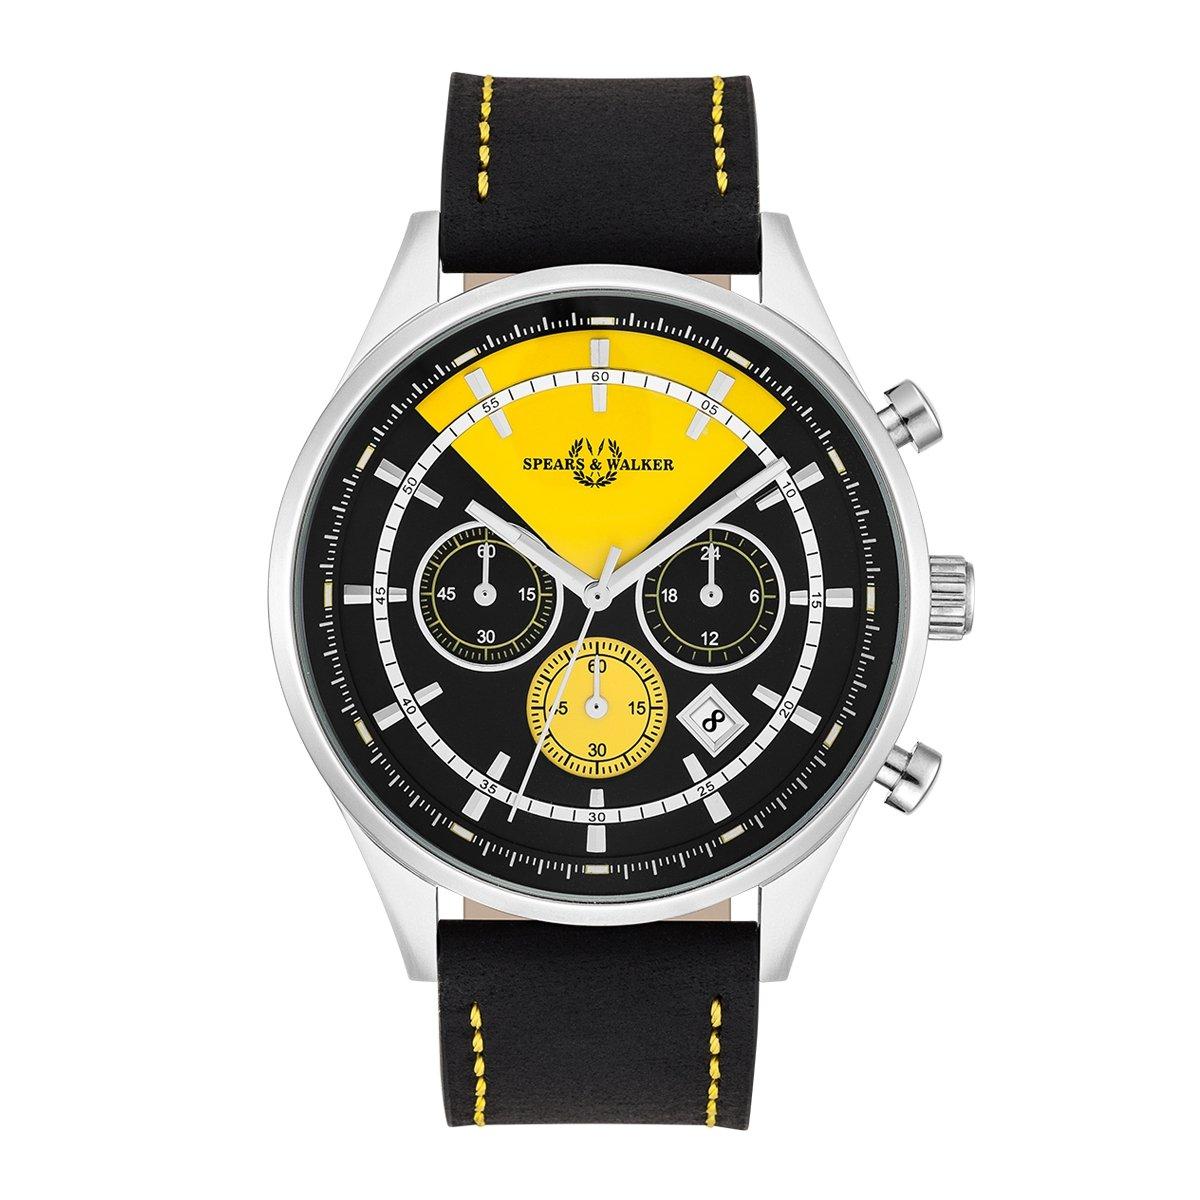 Empire & Walker Power Racer - Reloj de hombre cronógrafo acero inoxidable plata/negro amarillo 5 ATM de precisión cuarzo Cronómetro/totalisatoren pulsera de ...